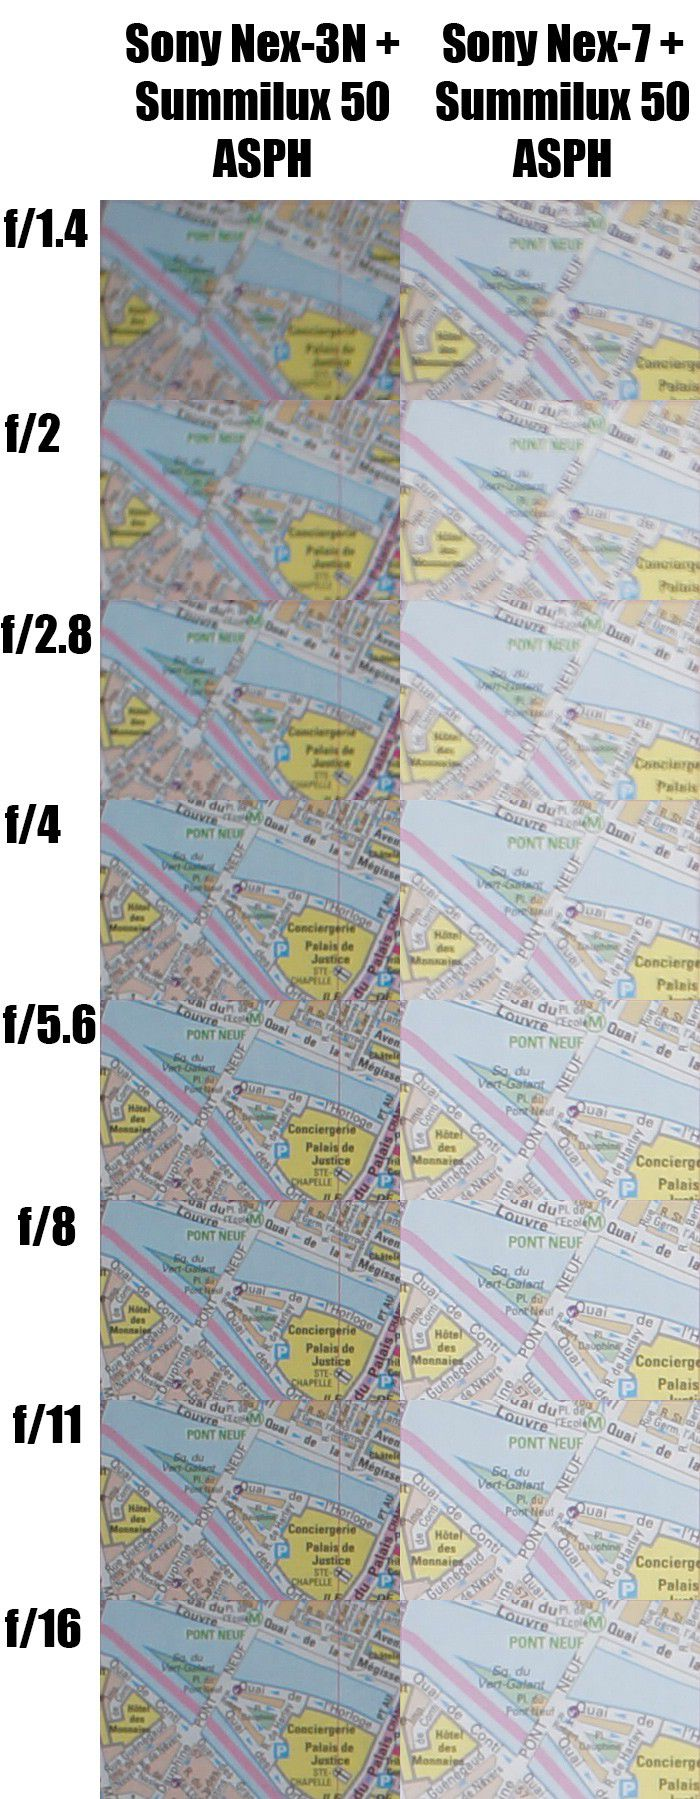 Comparatif Nex3N vs Nex7 Plan